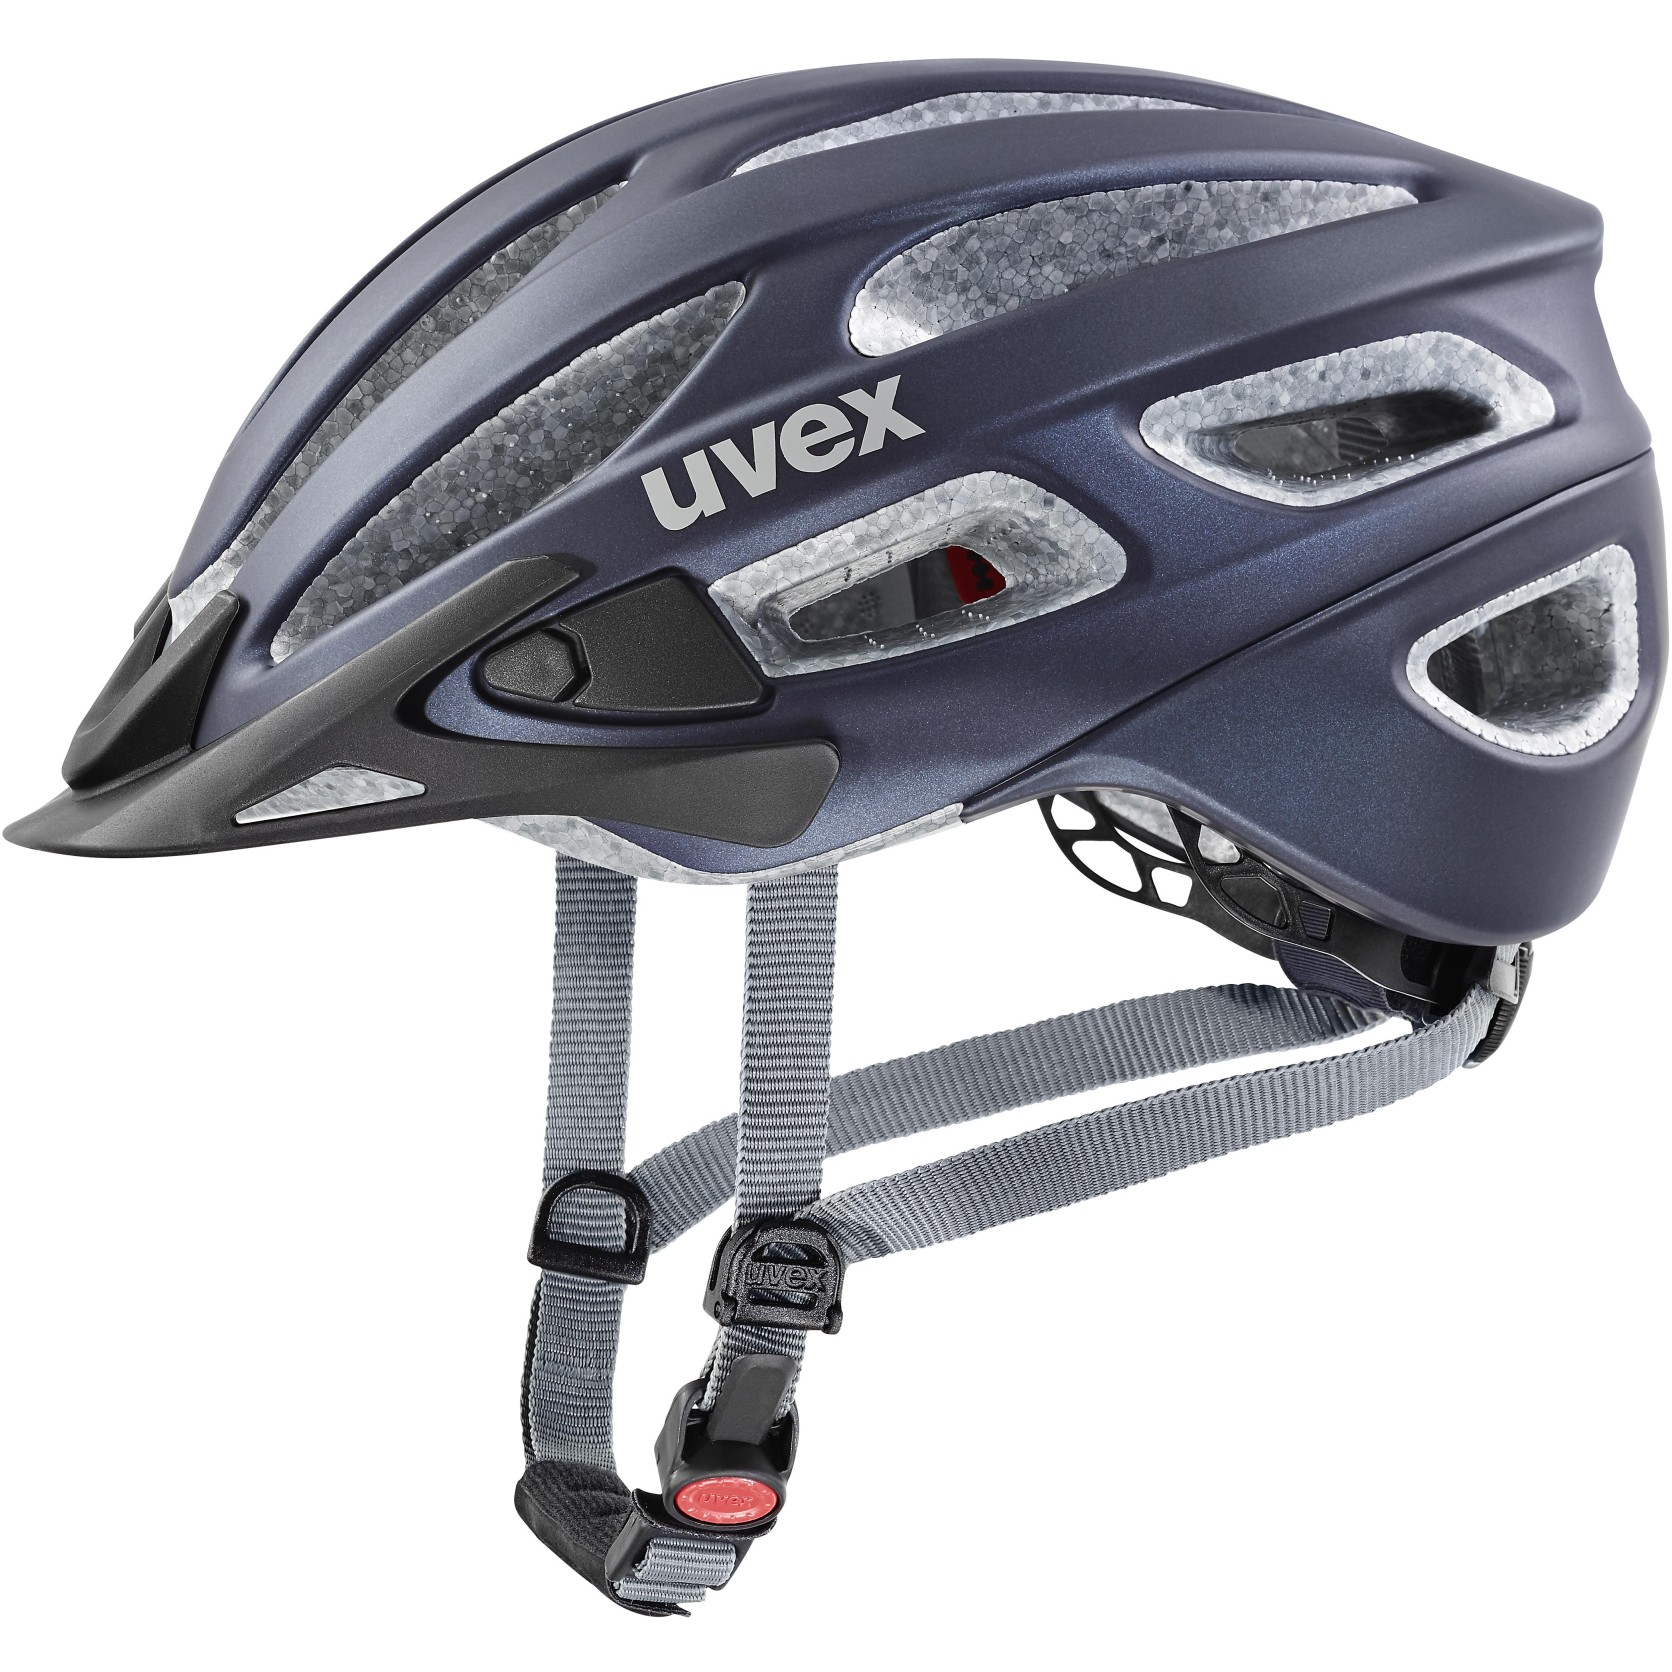 Uvex true cc Helmet - deep space mat